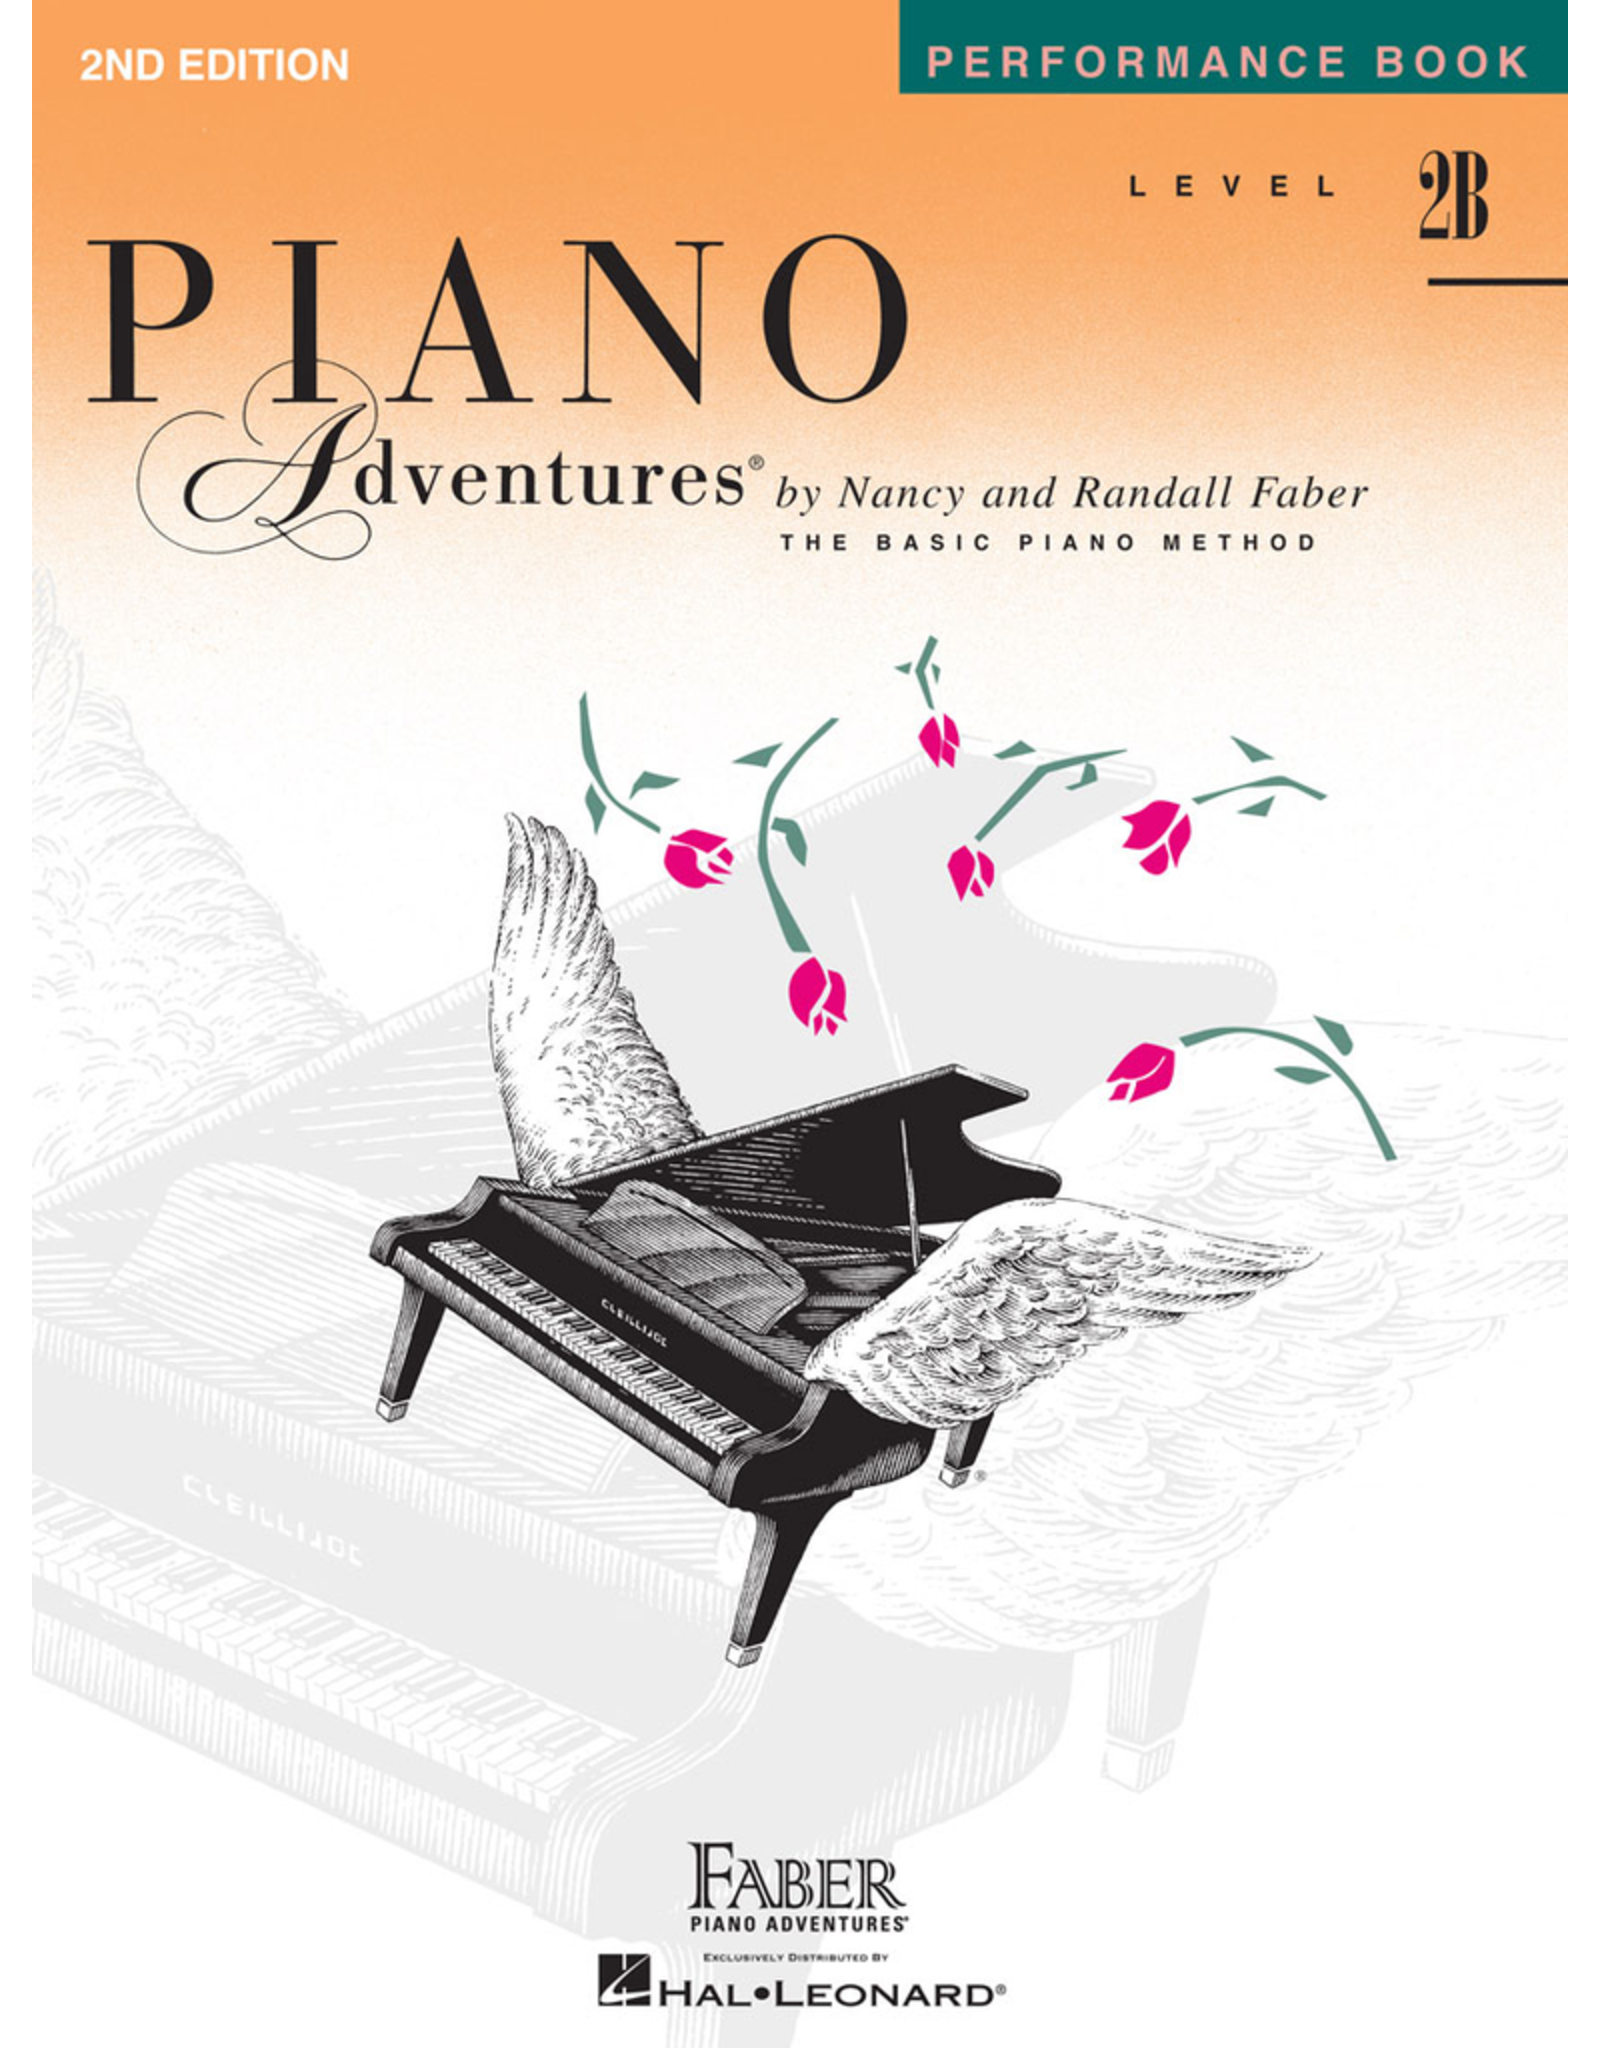 Hal Leonard Piano Adventures Performance, Level 2B